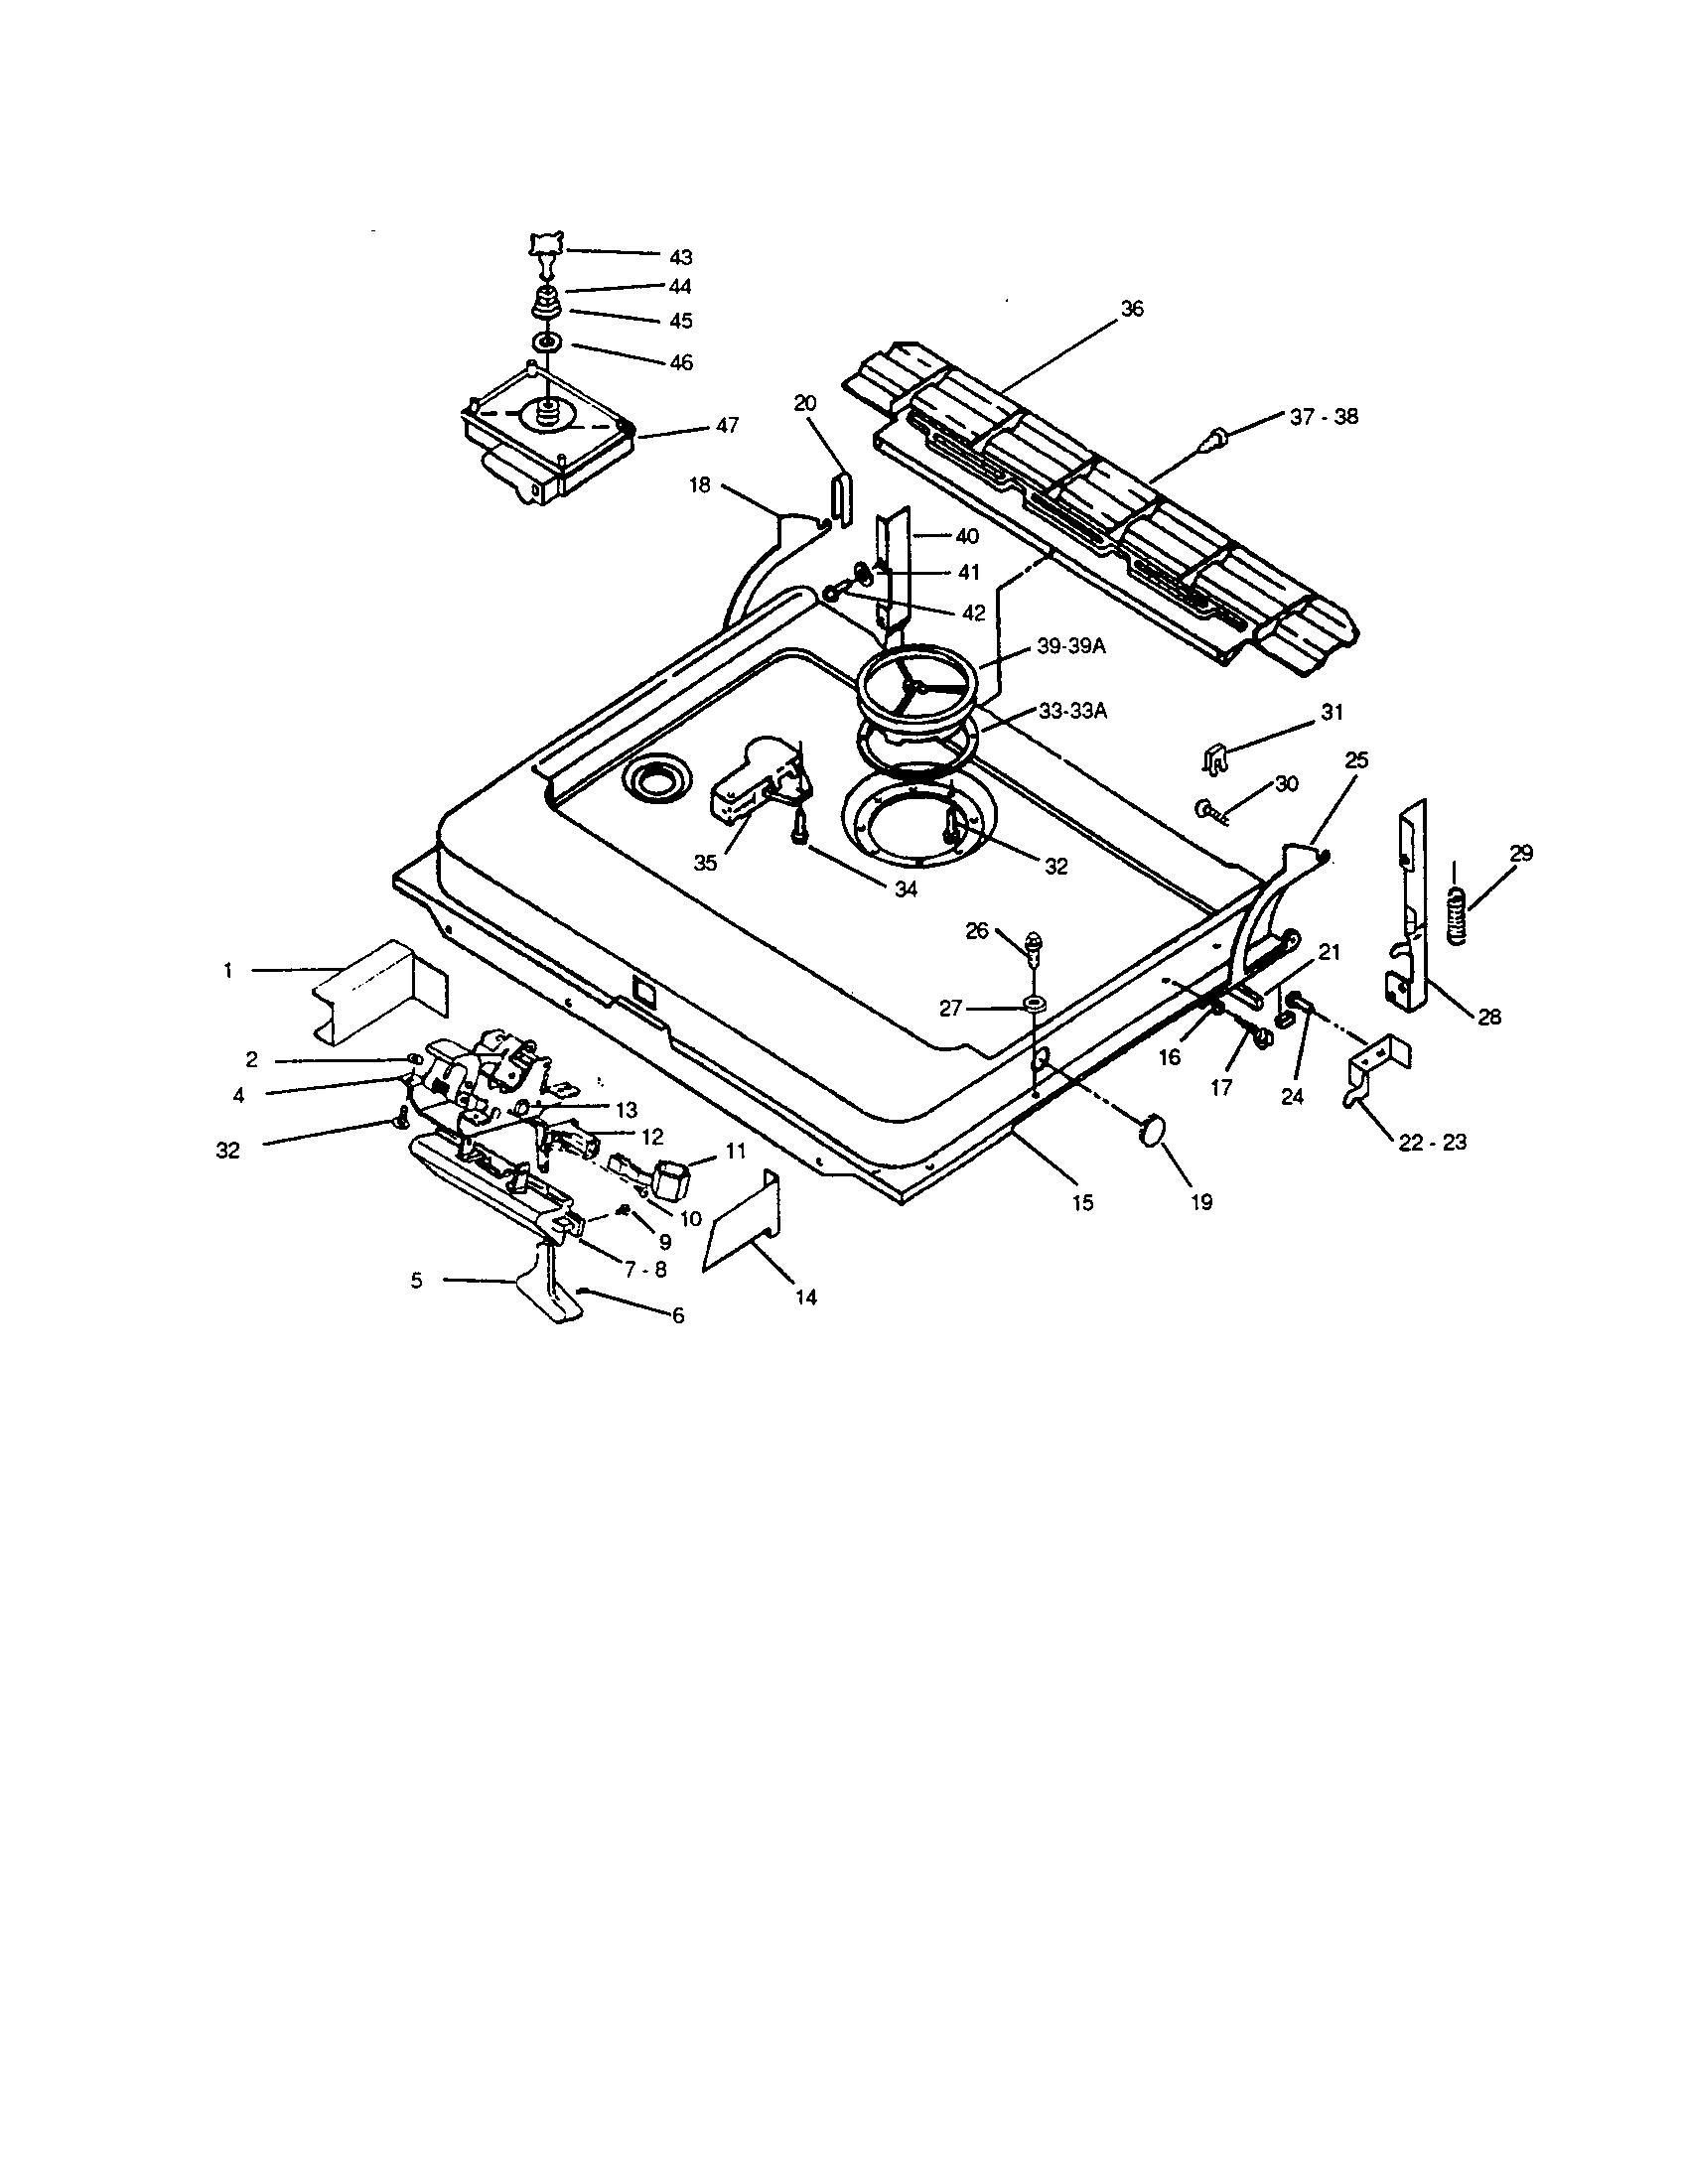 DOOR AND LATCH UNIT Diagram & Parts List for Model CL7004